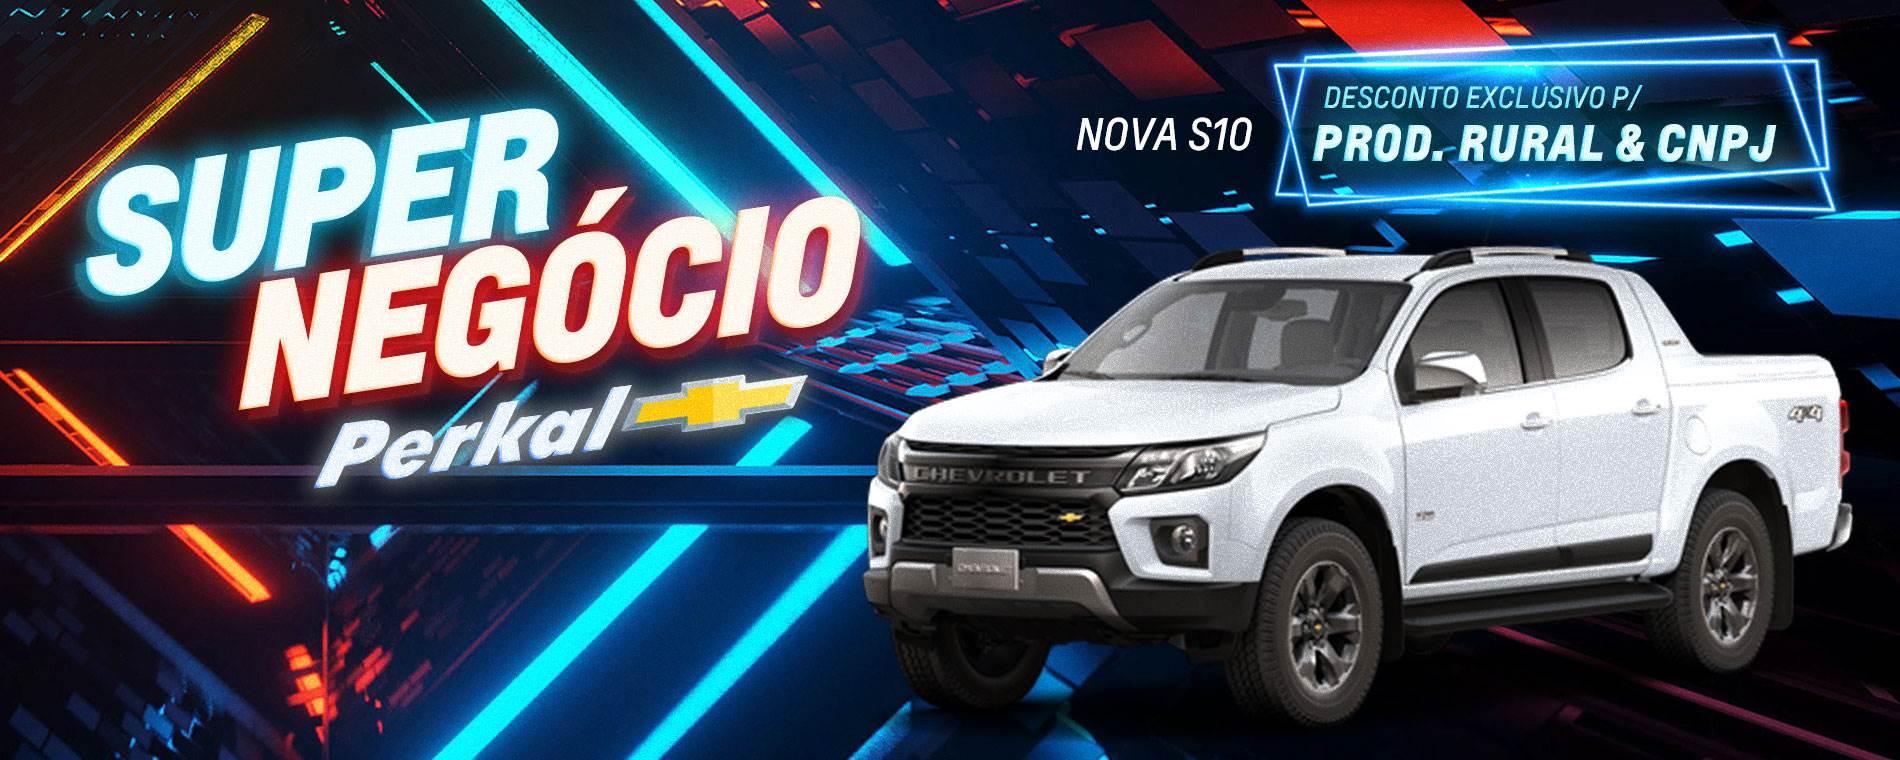 nova-s10